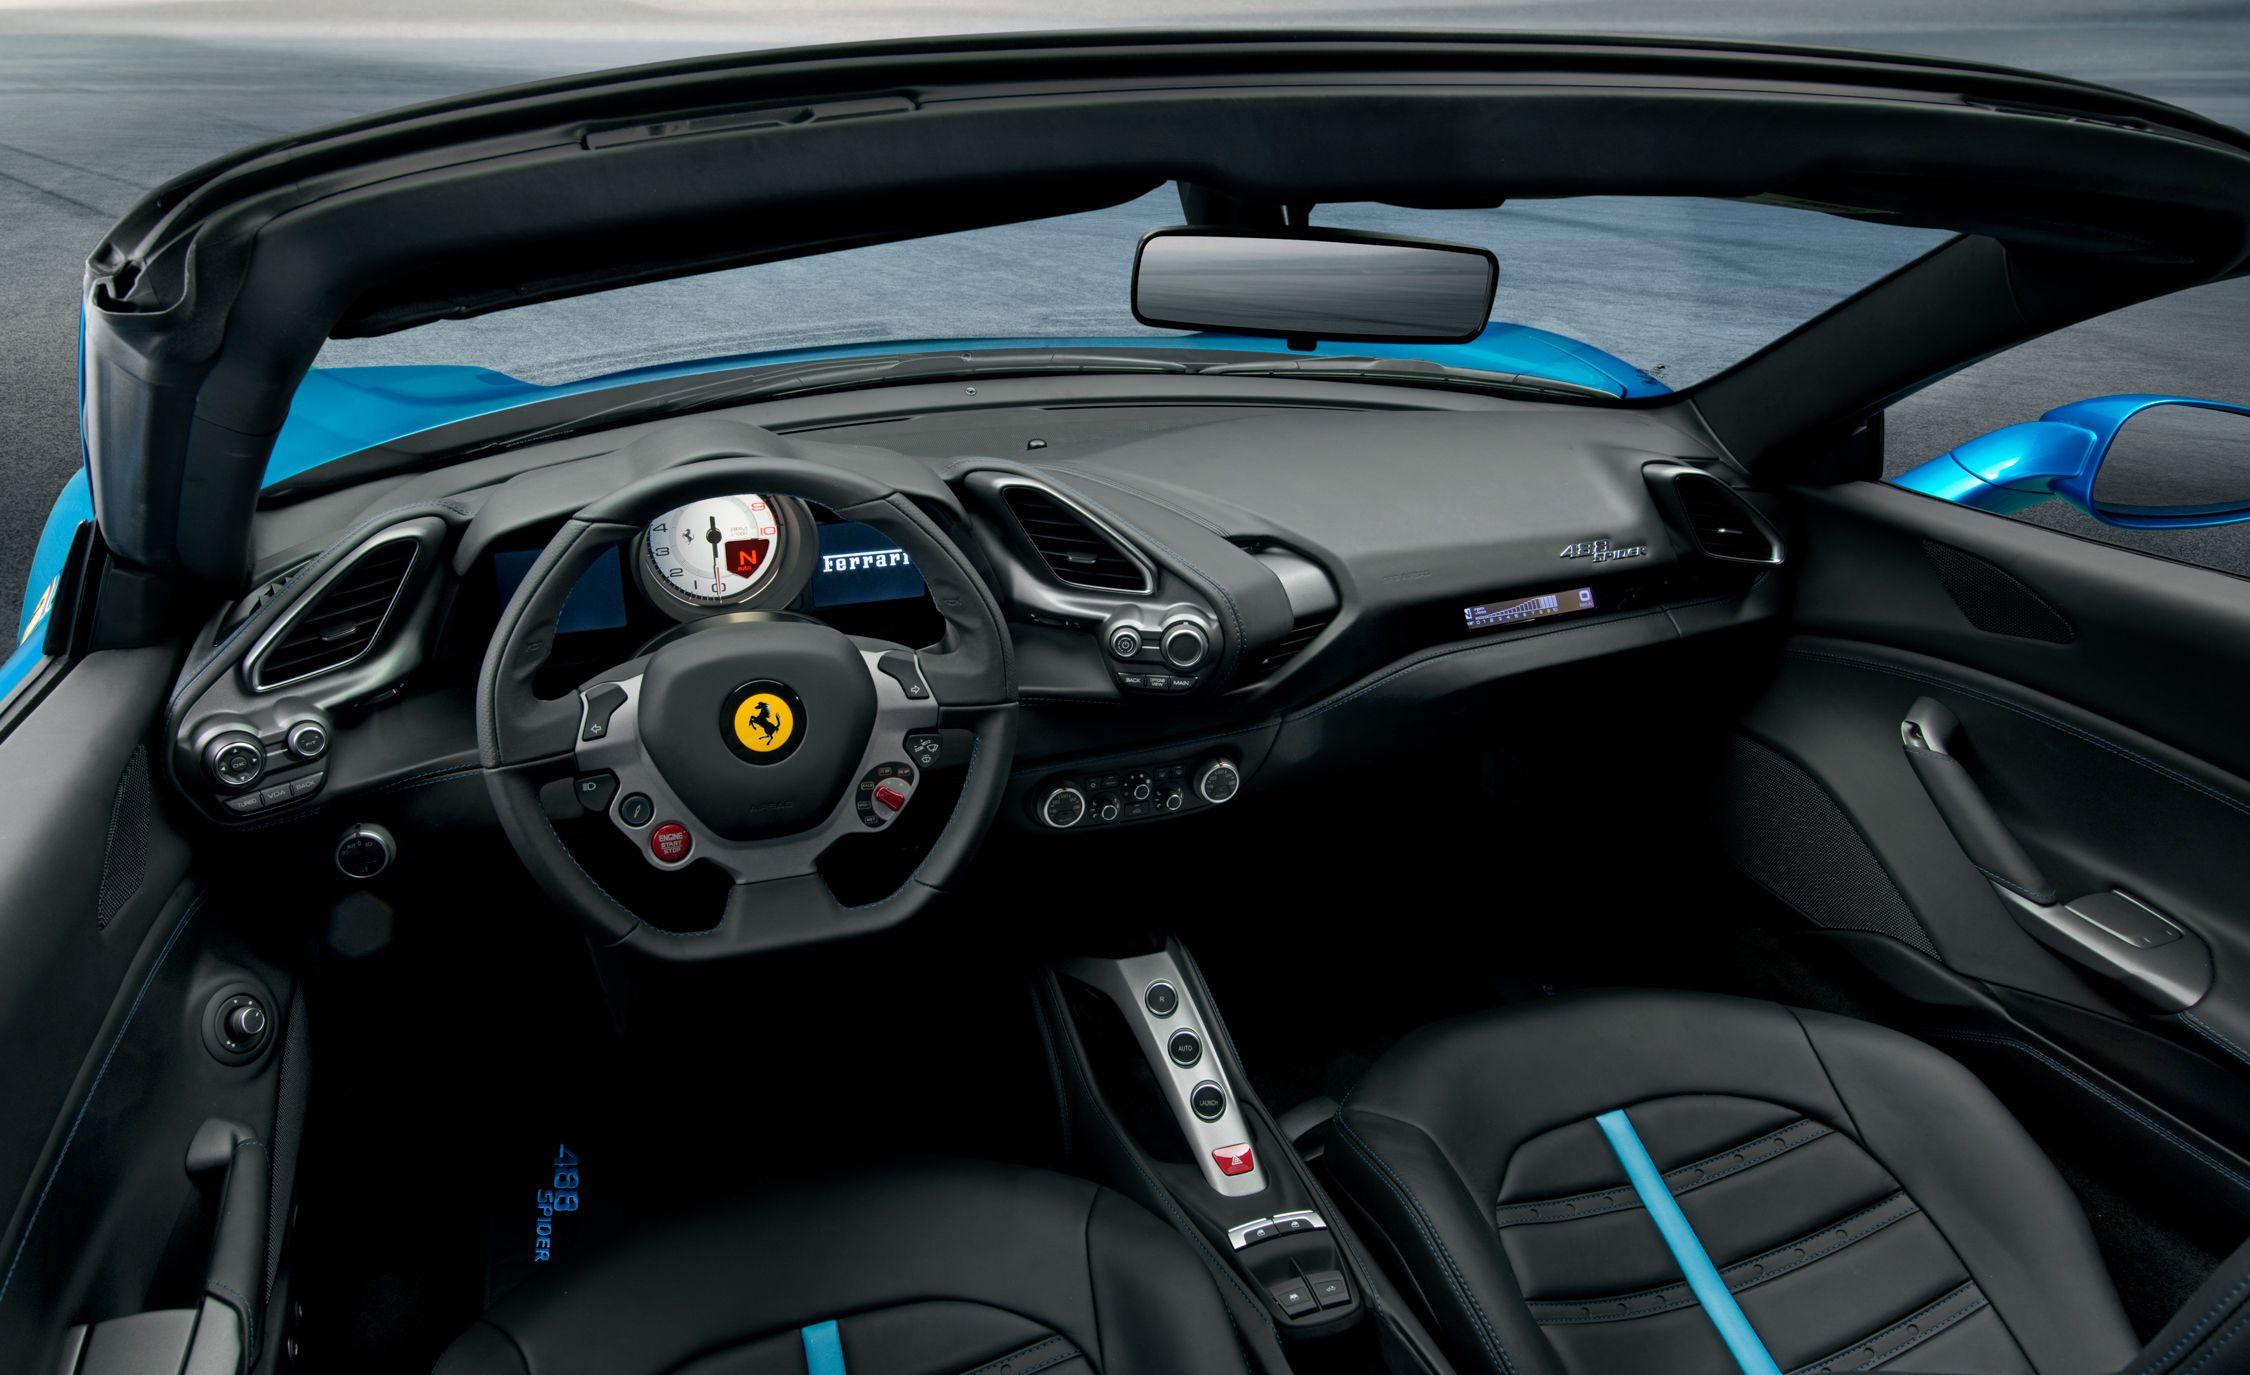 2016 Ferrari 488 Spider The 488gtb Gains A Folding Roof News Car And Driver